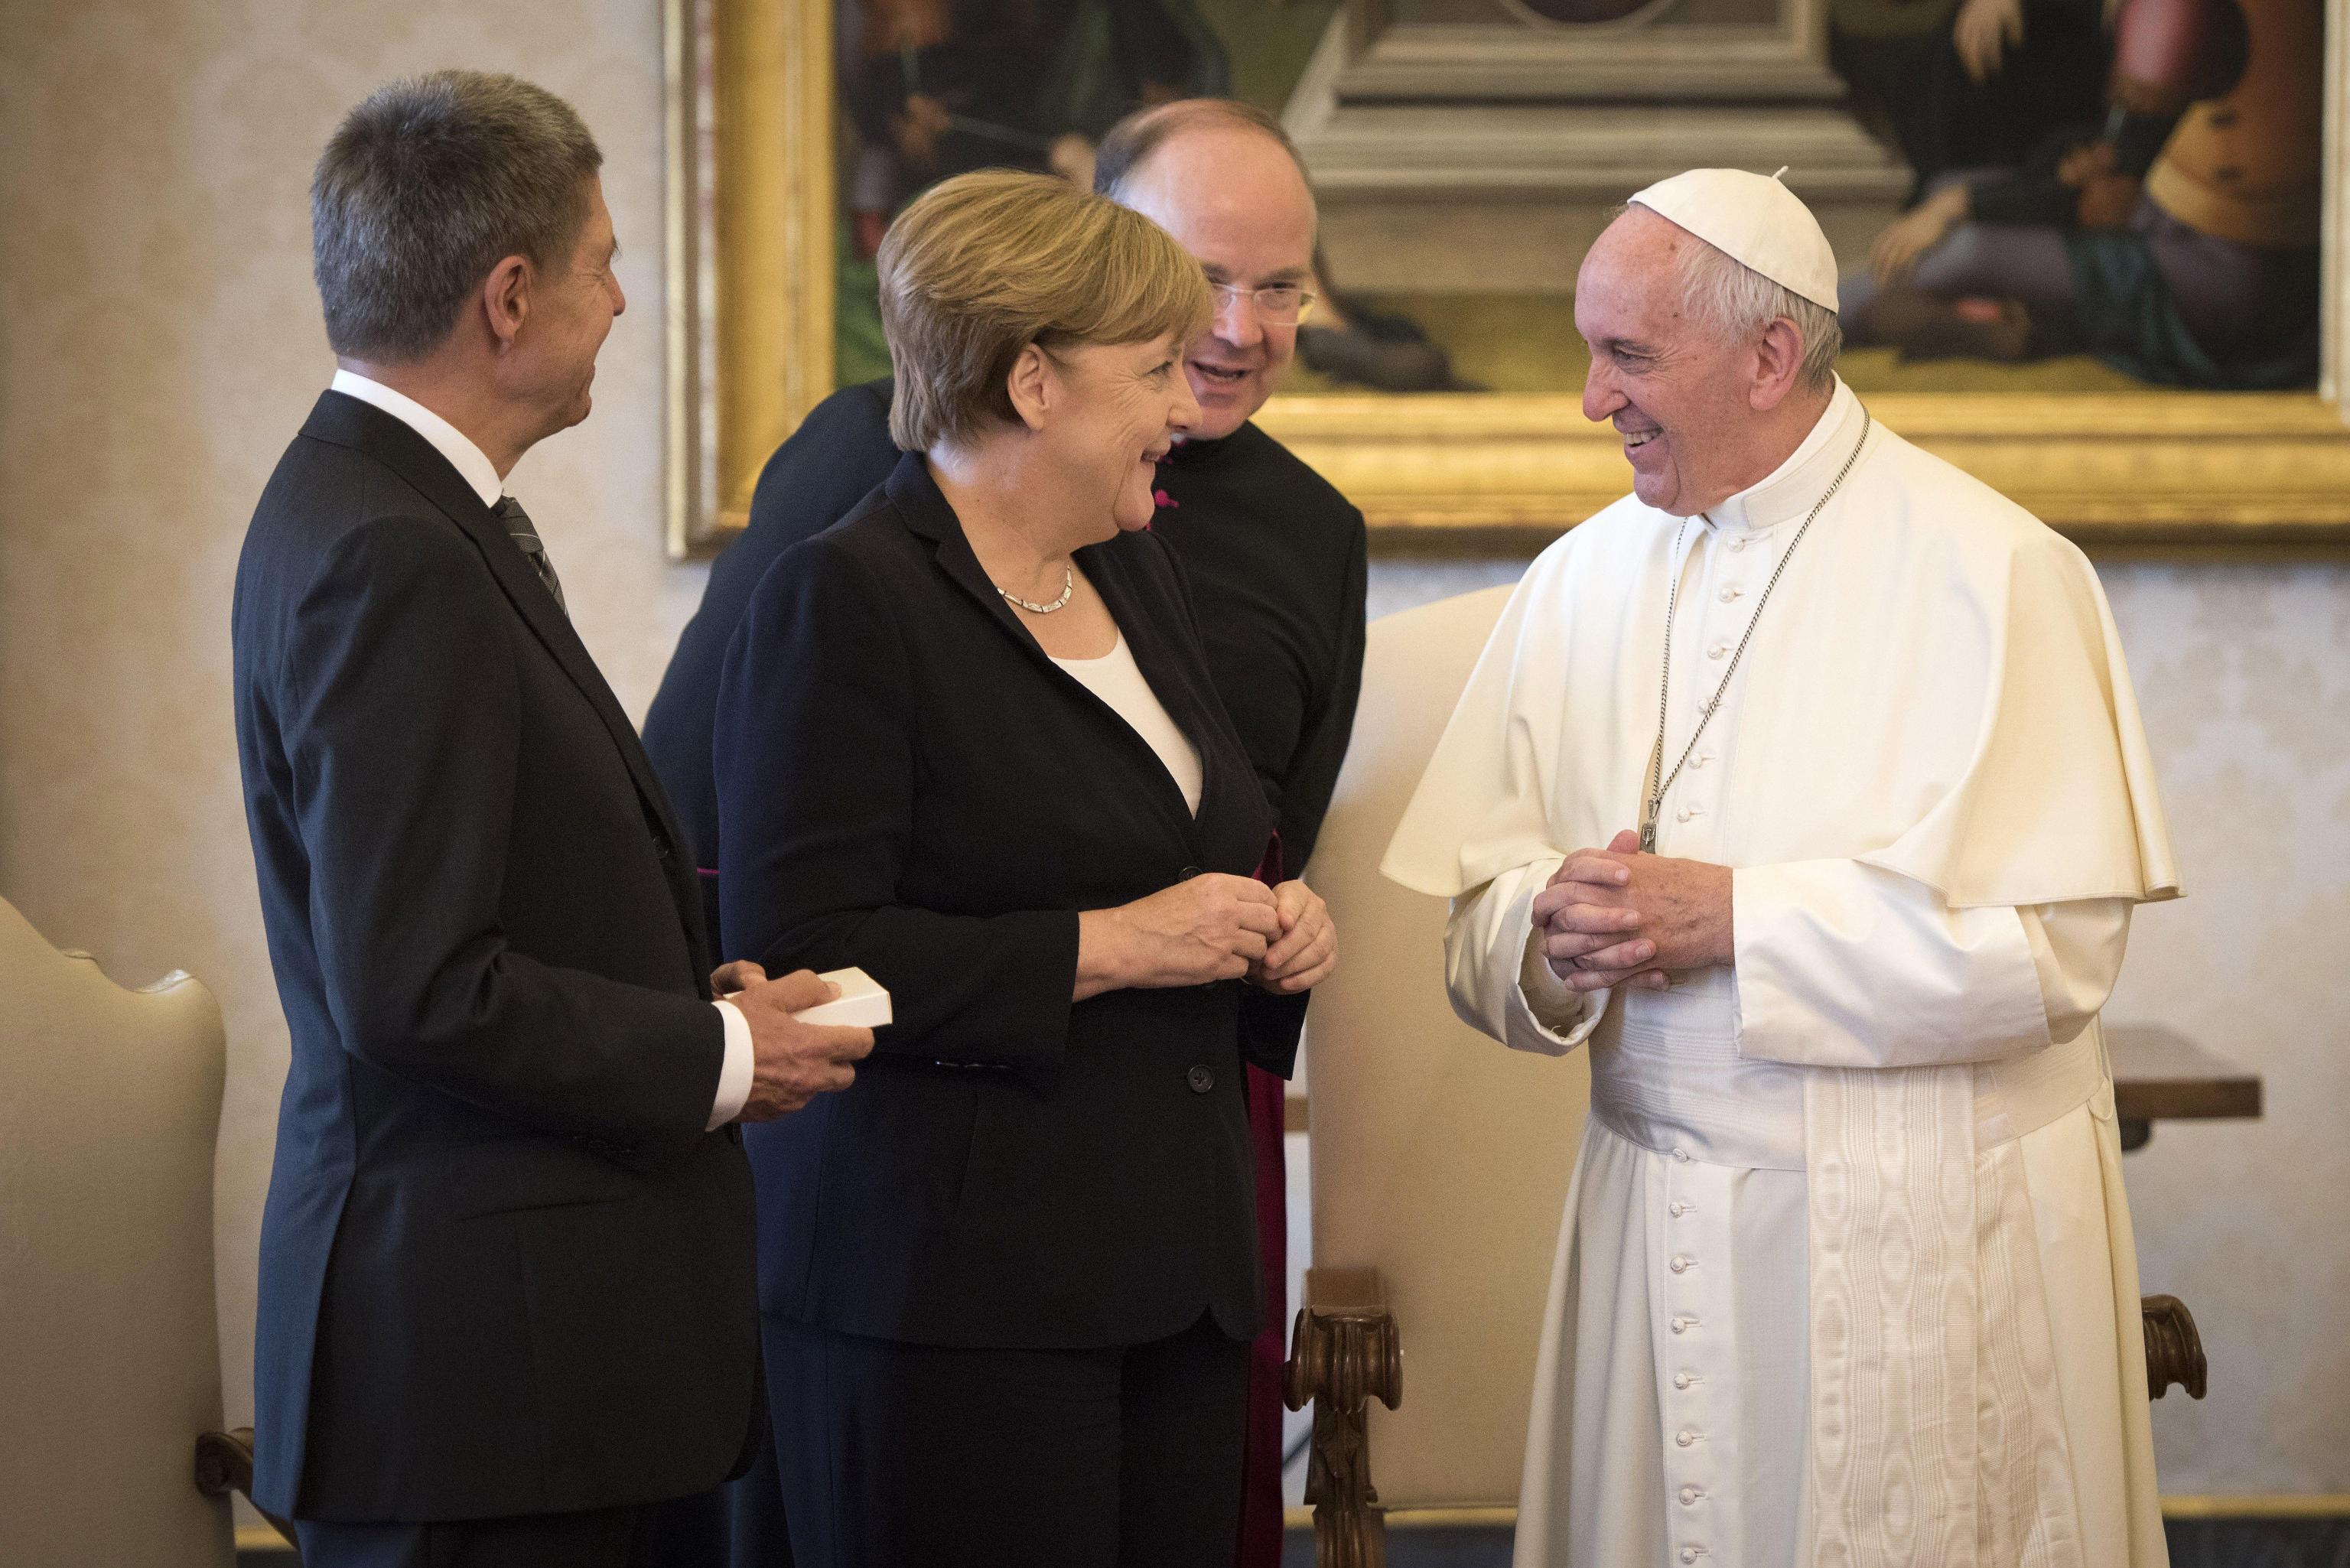 Vaticano, Angela Merkel ricevuta da Papa Francesco